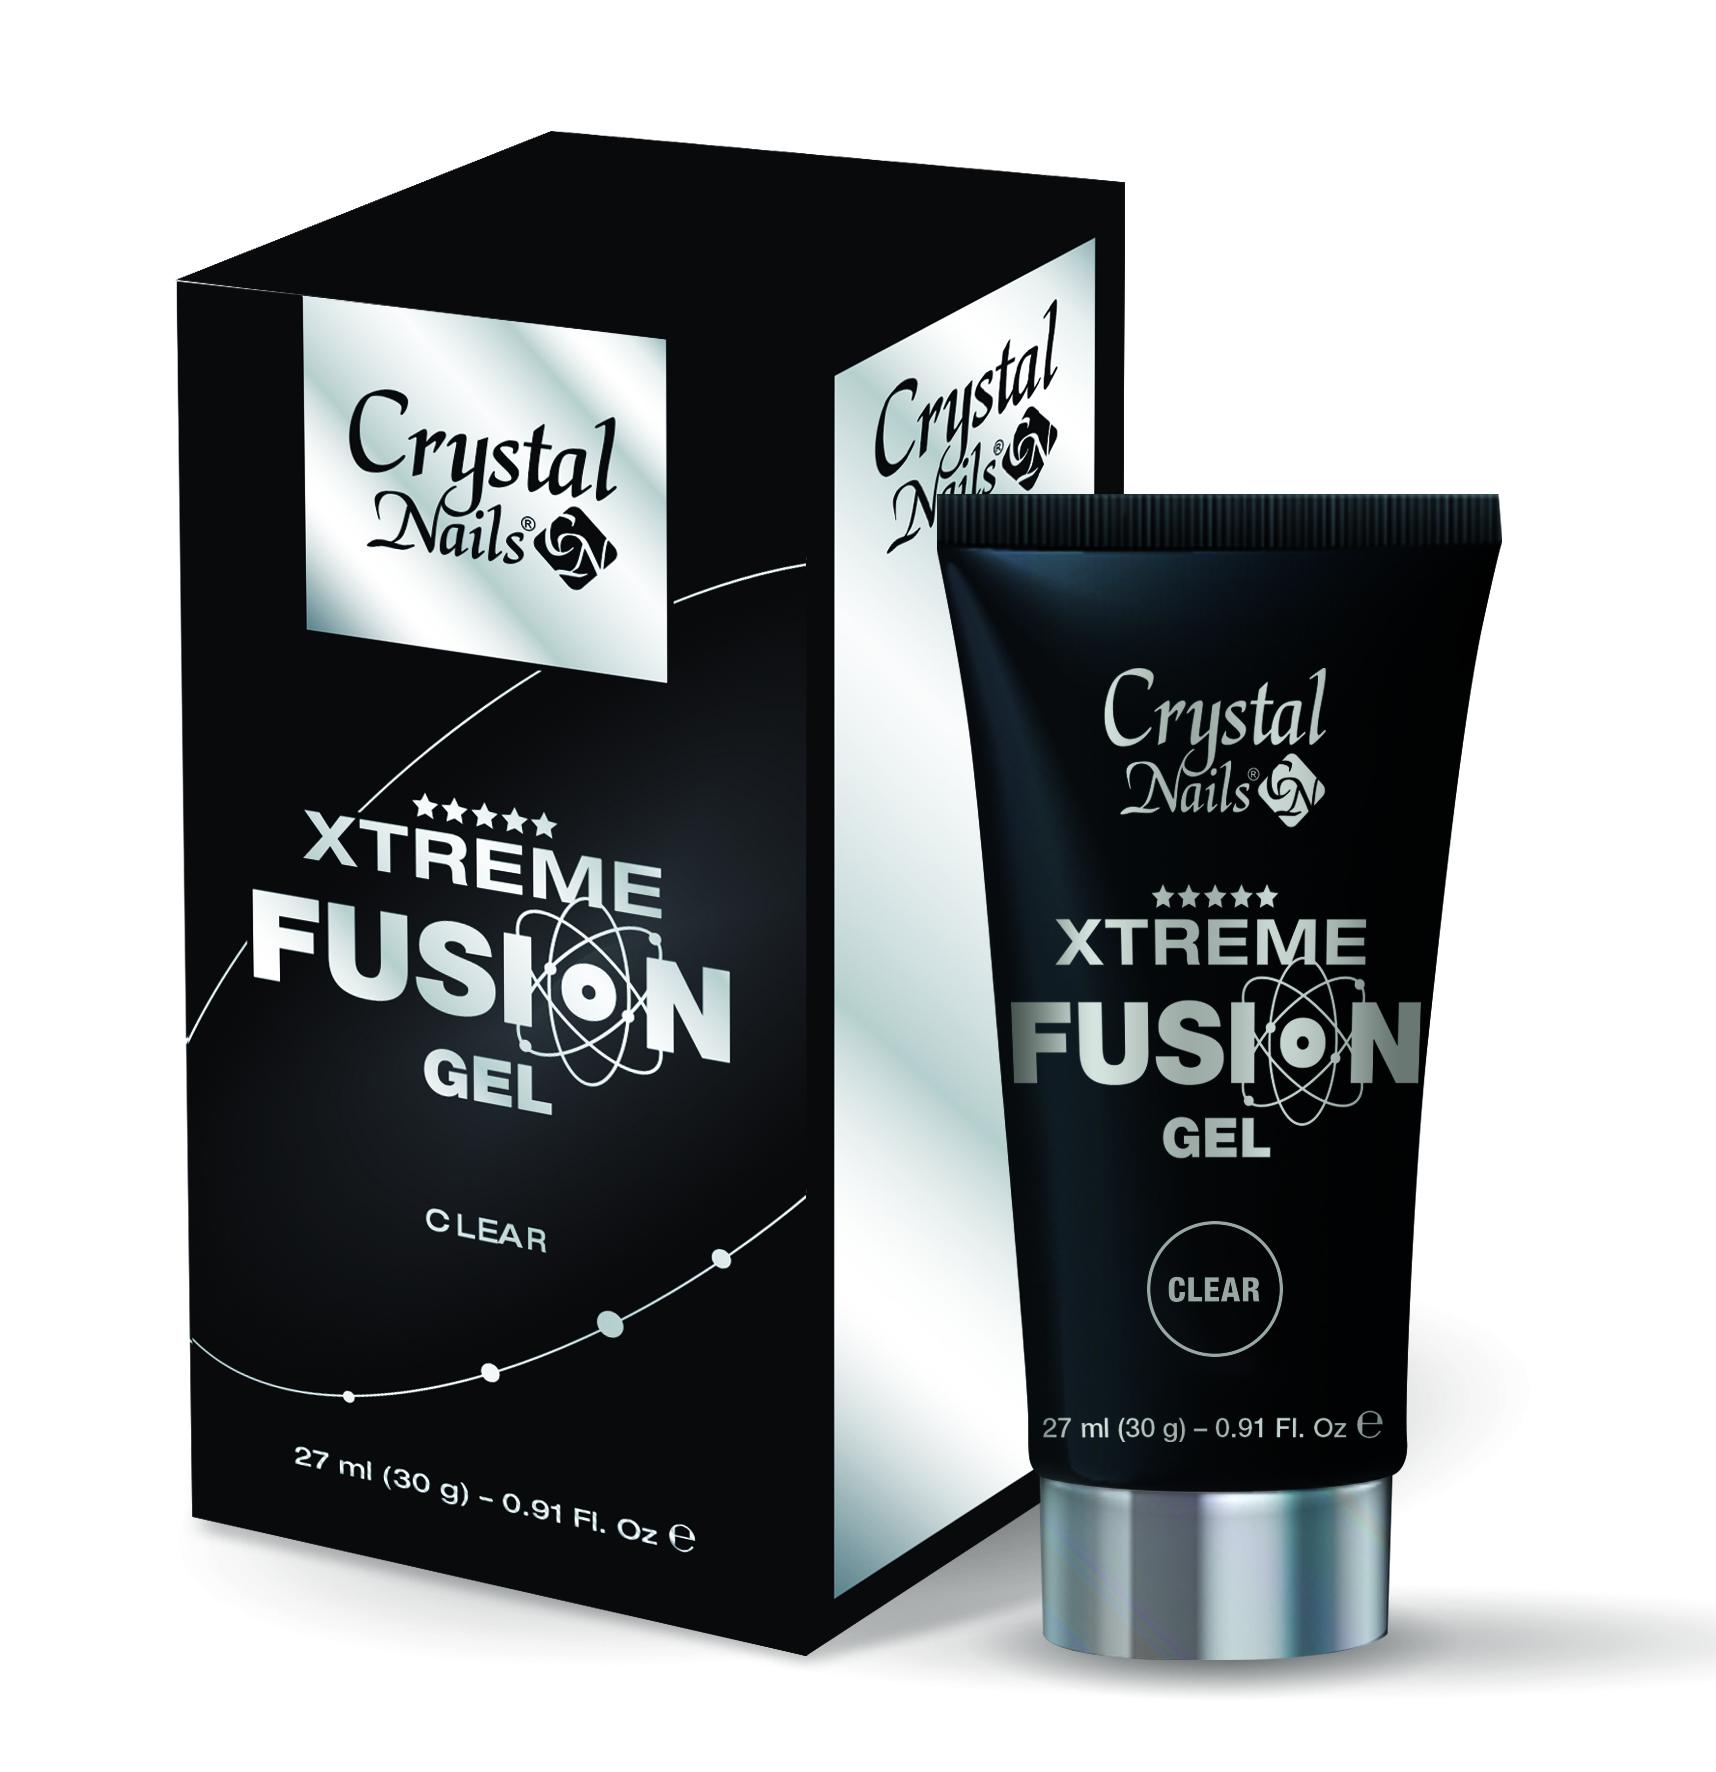 Xtreme Fusion AcrylGel Clear - 30g